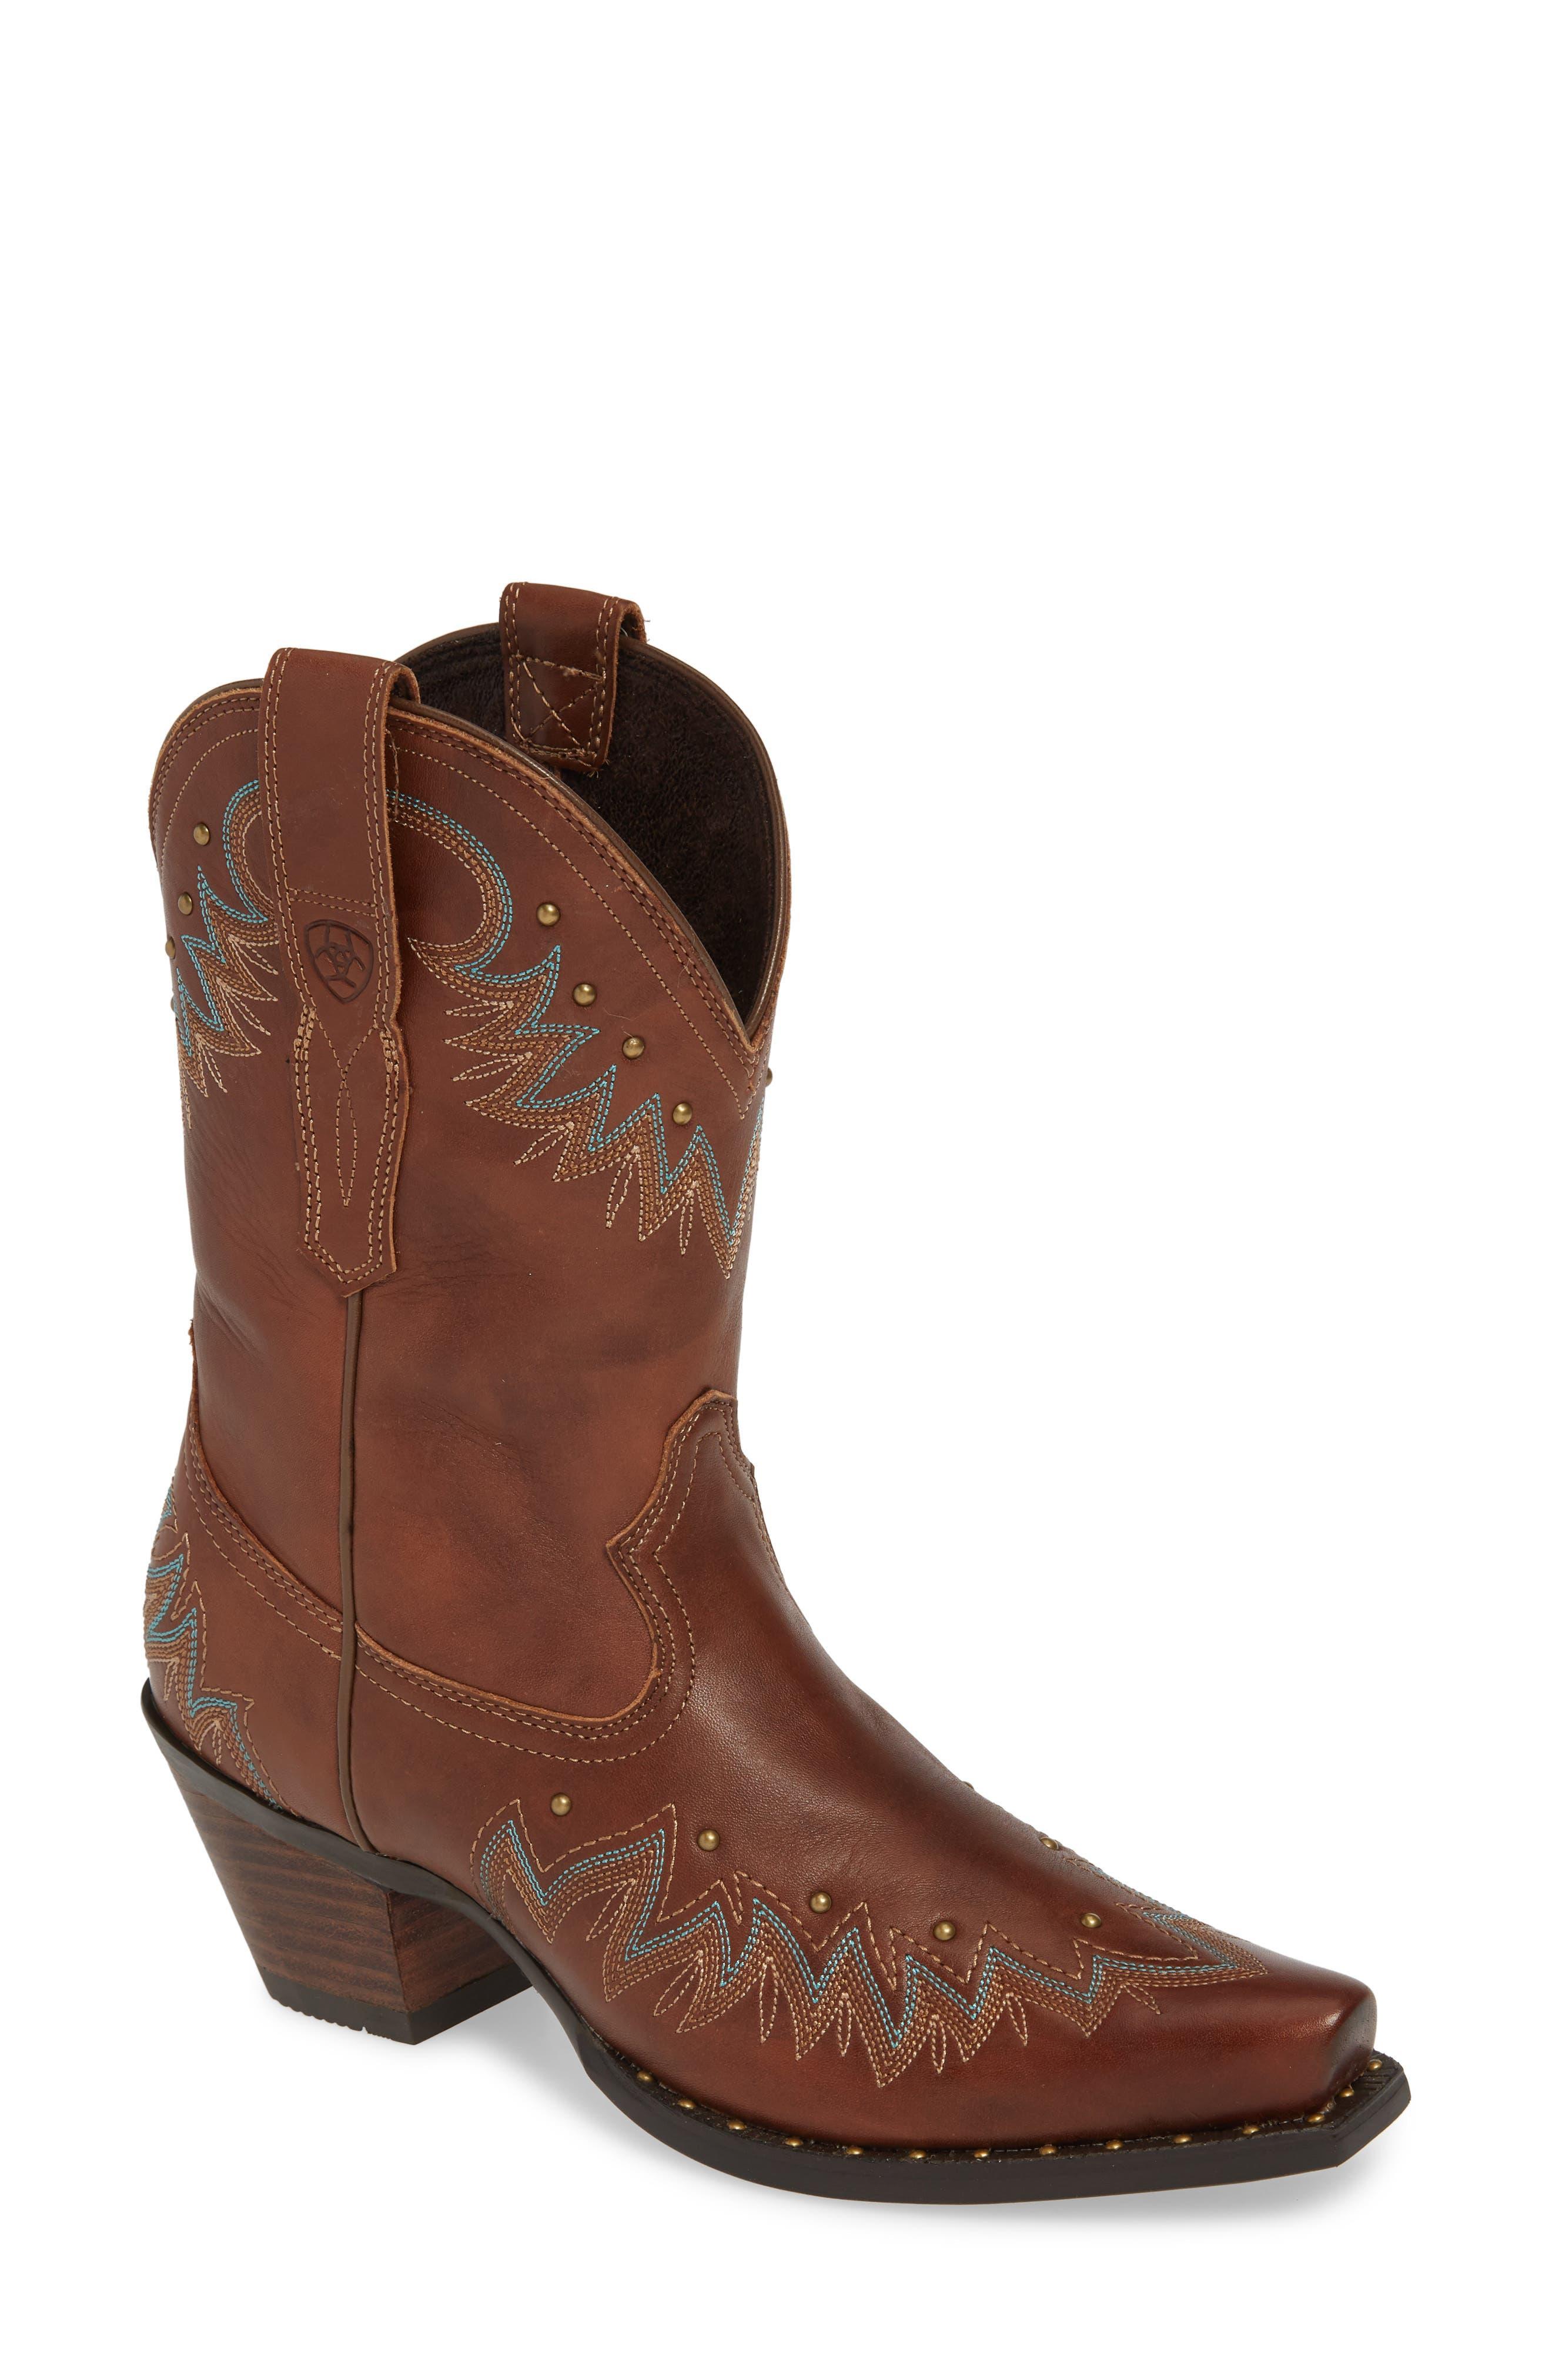 Ariat Potrero Western Boot- Brown